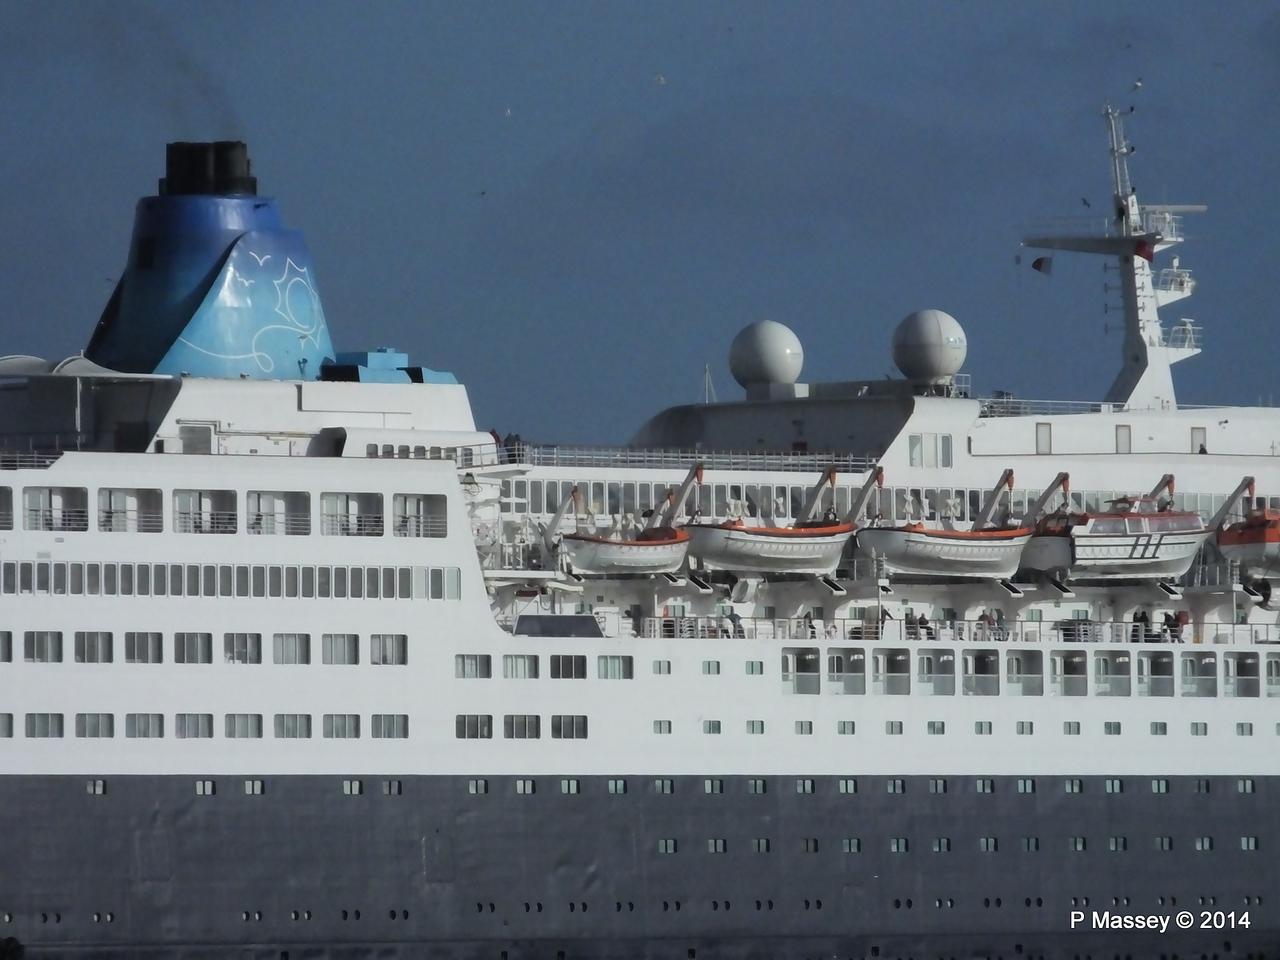 SAGA SAPPHIRE Departing Southampton PDM 07-01-2014 12-20-19